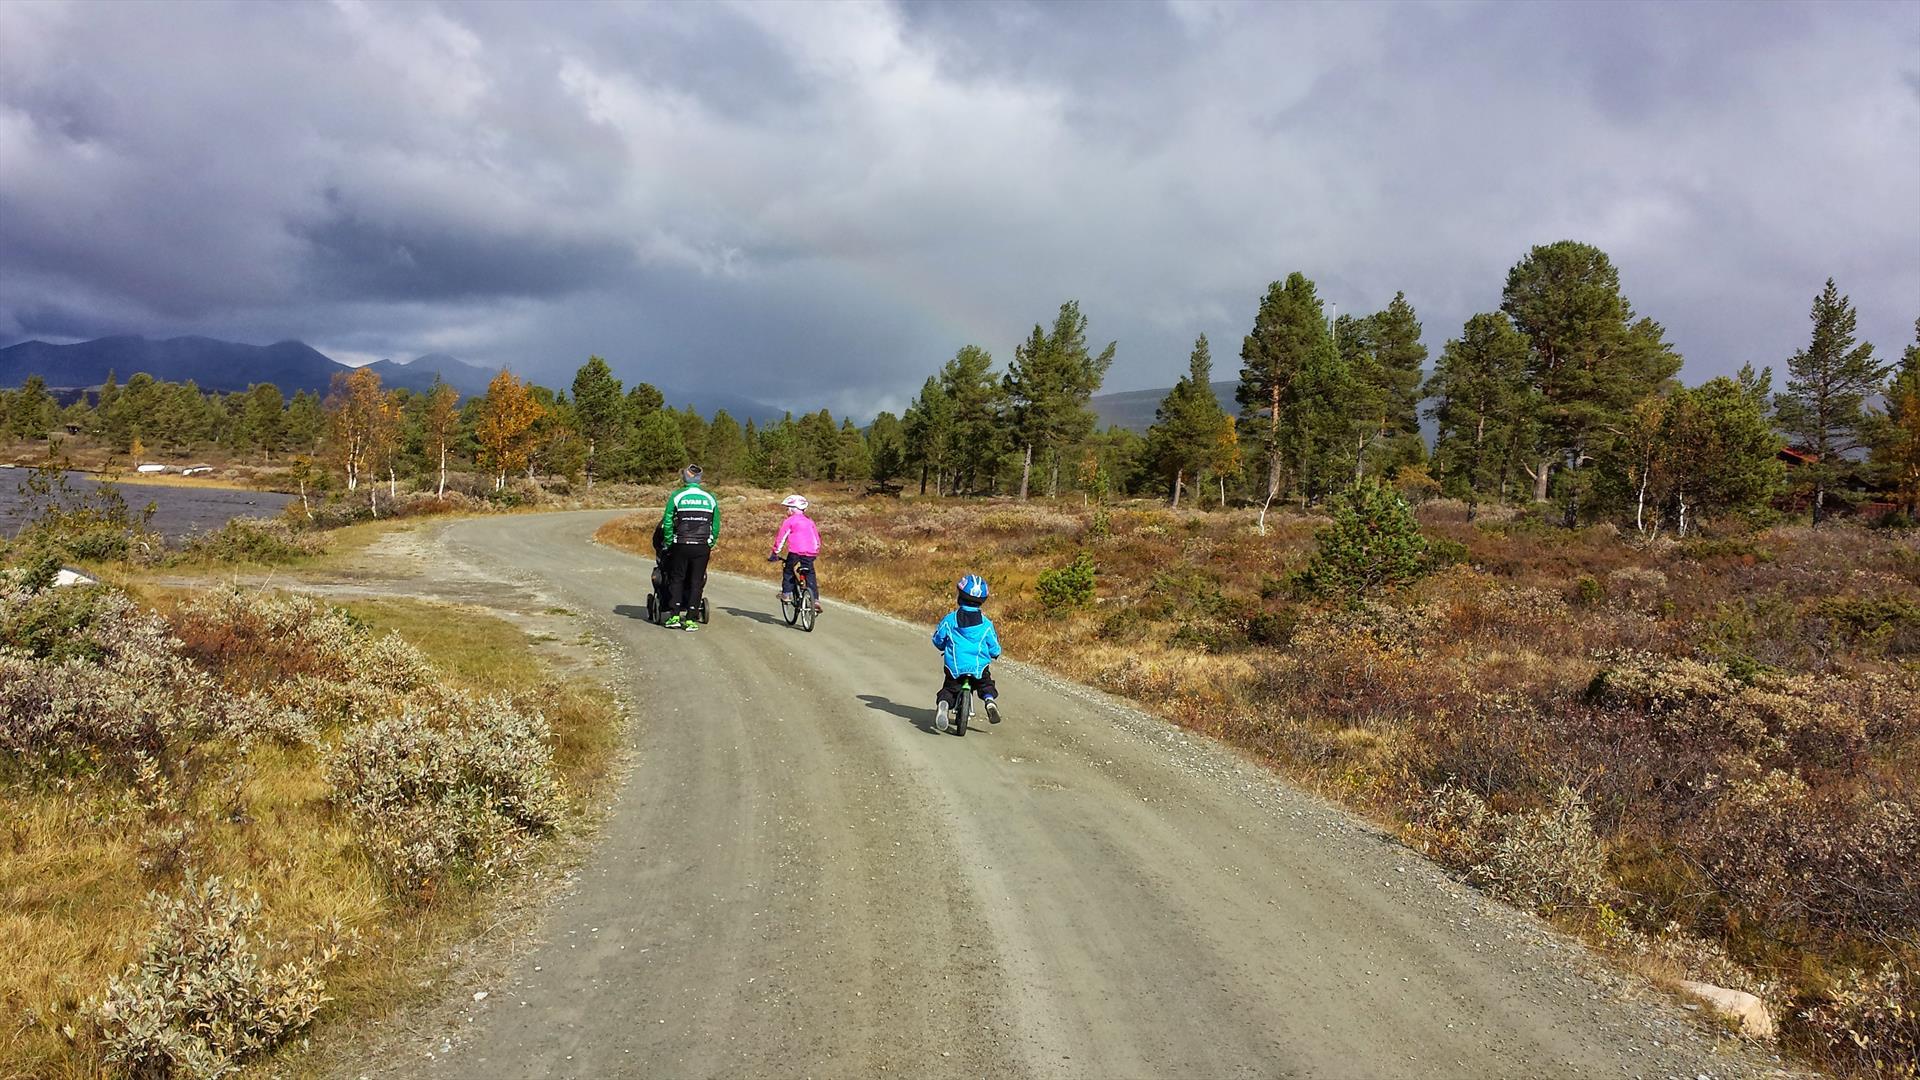 A familiy on tour along a dirt road